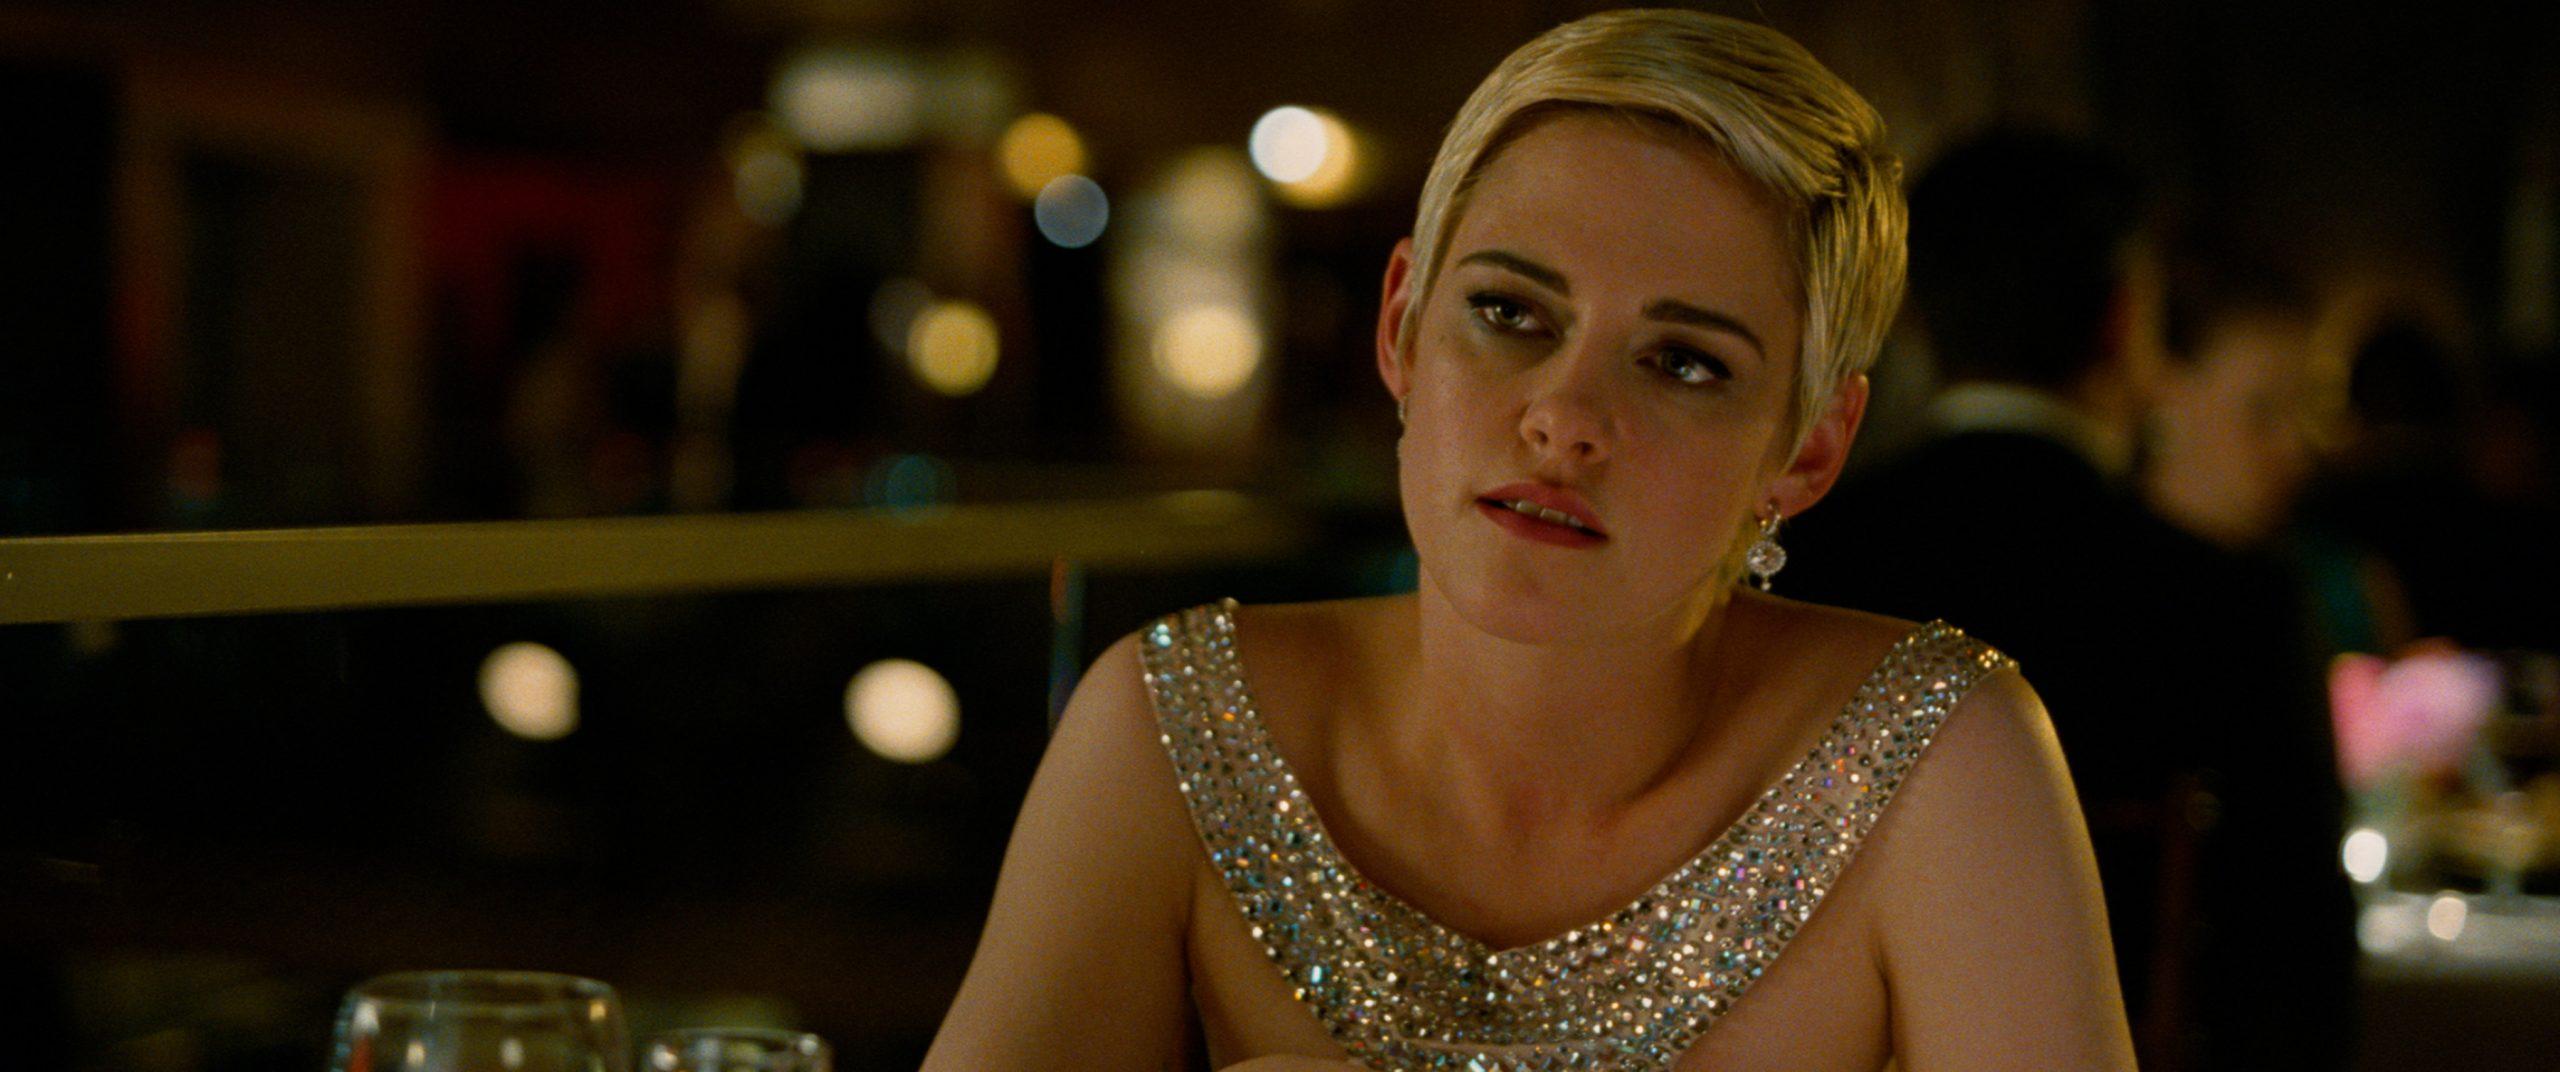 Kristen Stewart Will Leave You Breathless - That Shelf